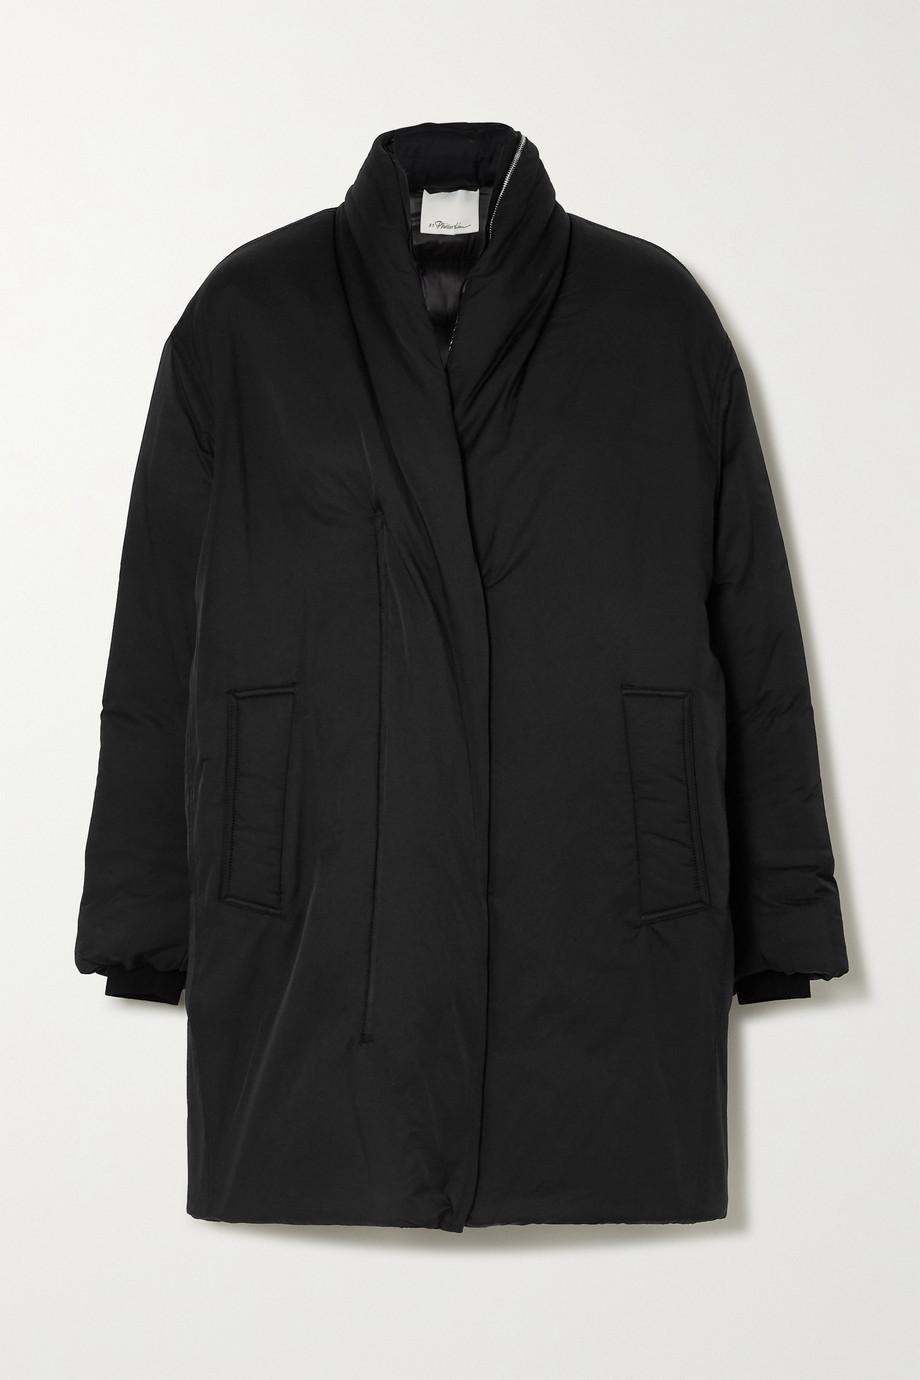 3.1 Phillip Lim 连帽大廓形带填充物棉质混纺软壳面料外套